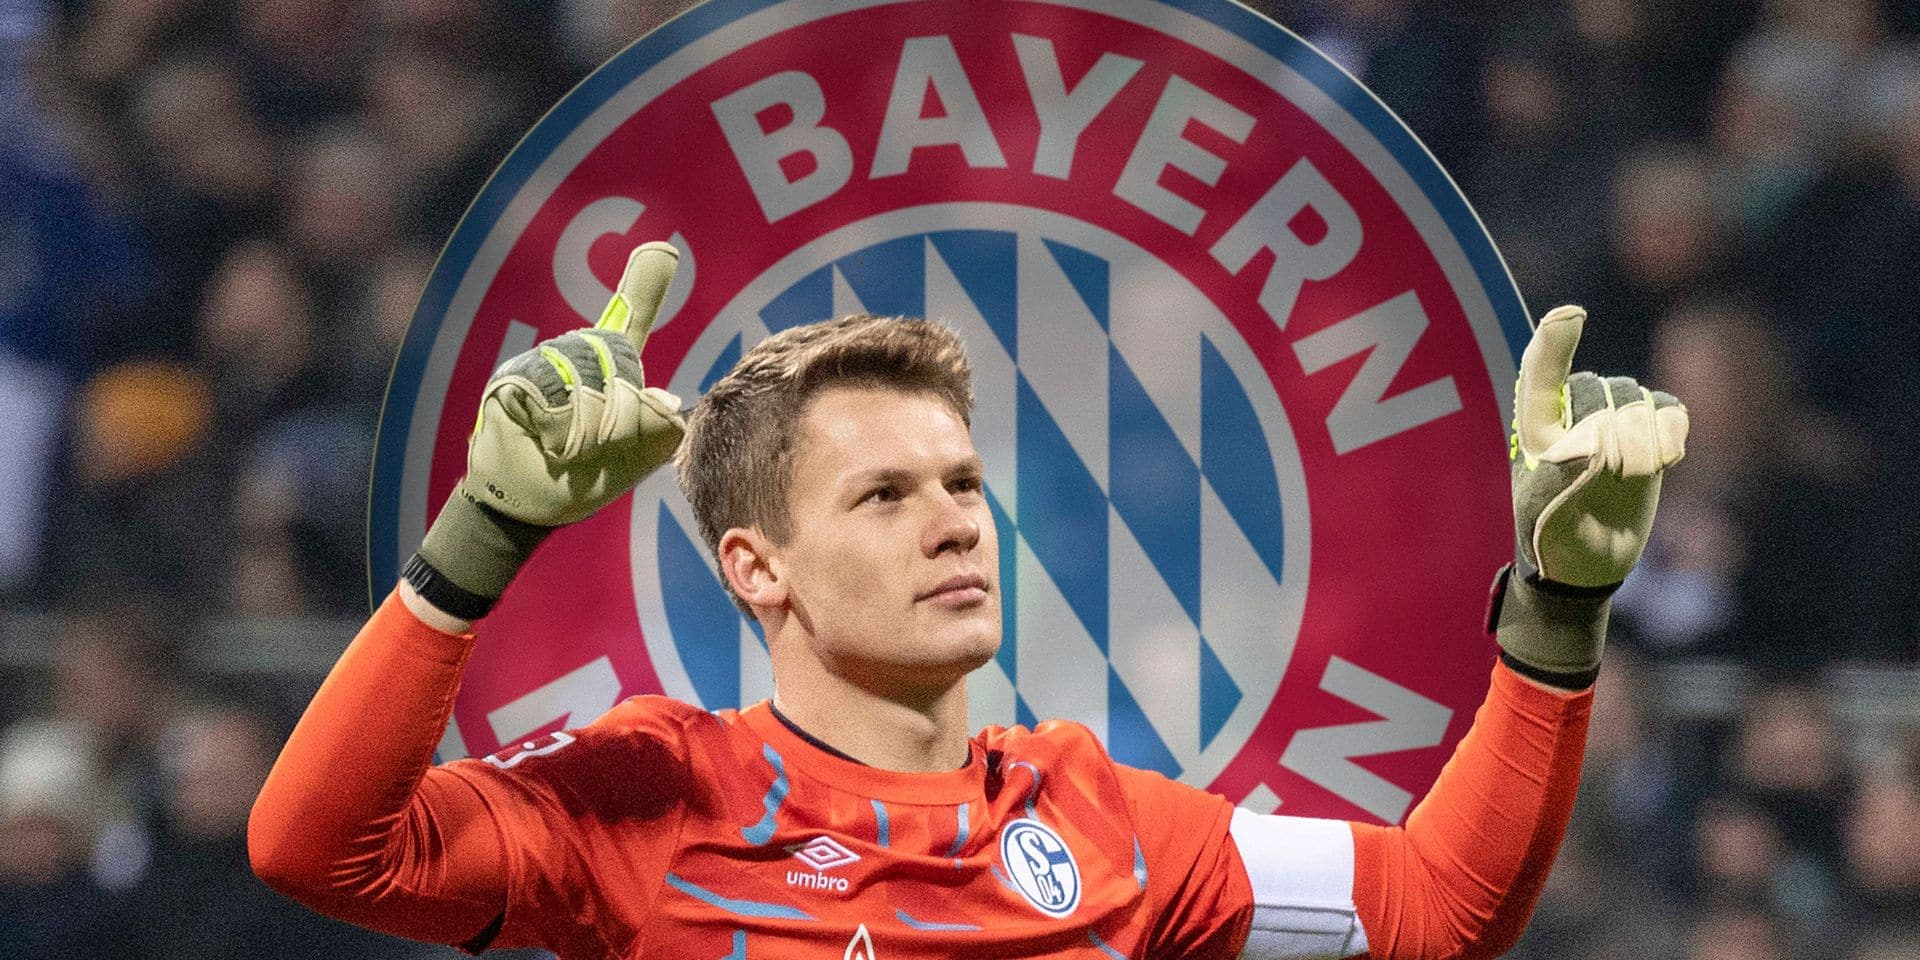 Le Bayern recrute Alexander Nübel, le gardien et capitaine de Schalke 04